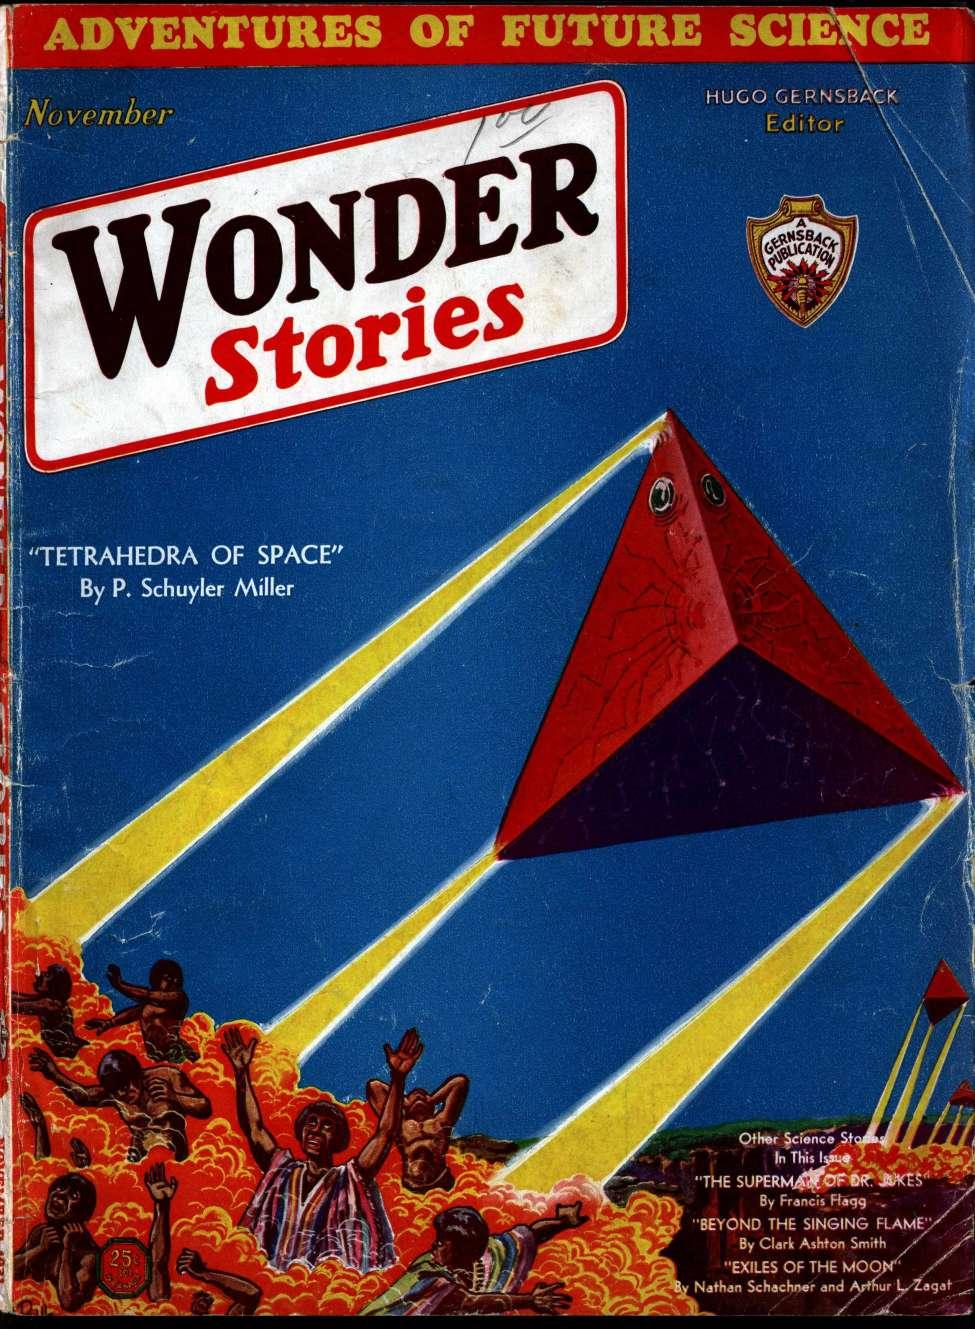 Comic Book Cover For Wonder Stories v3 06 - Tetrahedra of Space - P. Schuyler Miller